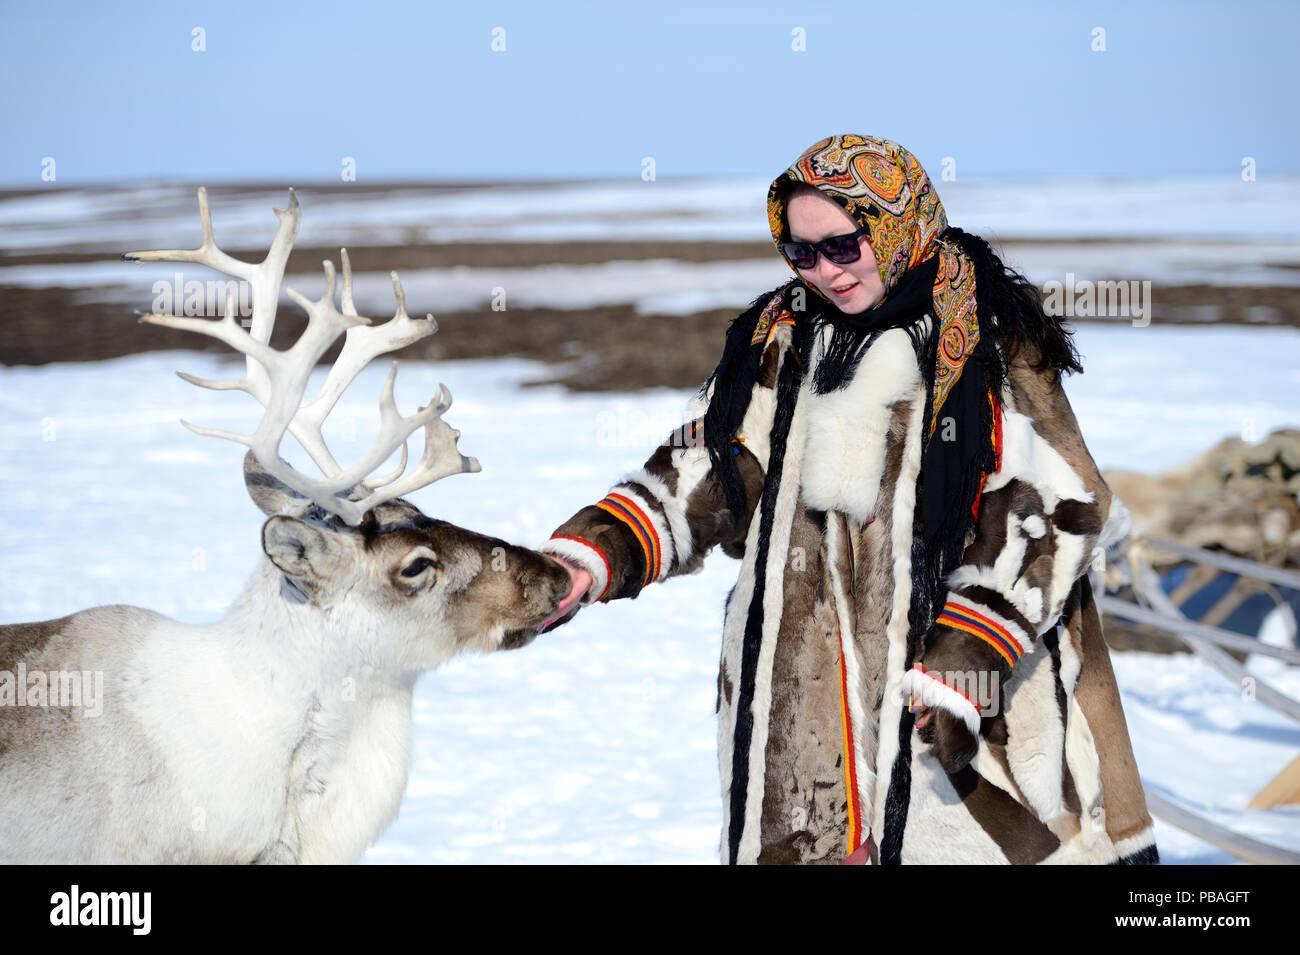 Carolina Serotetto, Nenet teenager dressed in traditional winter coat made of reindeer skin with  pet ''akva'' Reindeer (Rangifer tarandus). Yar-Sale district, Yamal, Northwest Siberia, Russia. April 2016. - Stock Image